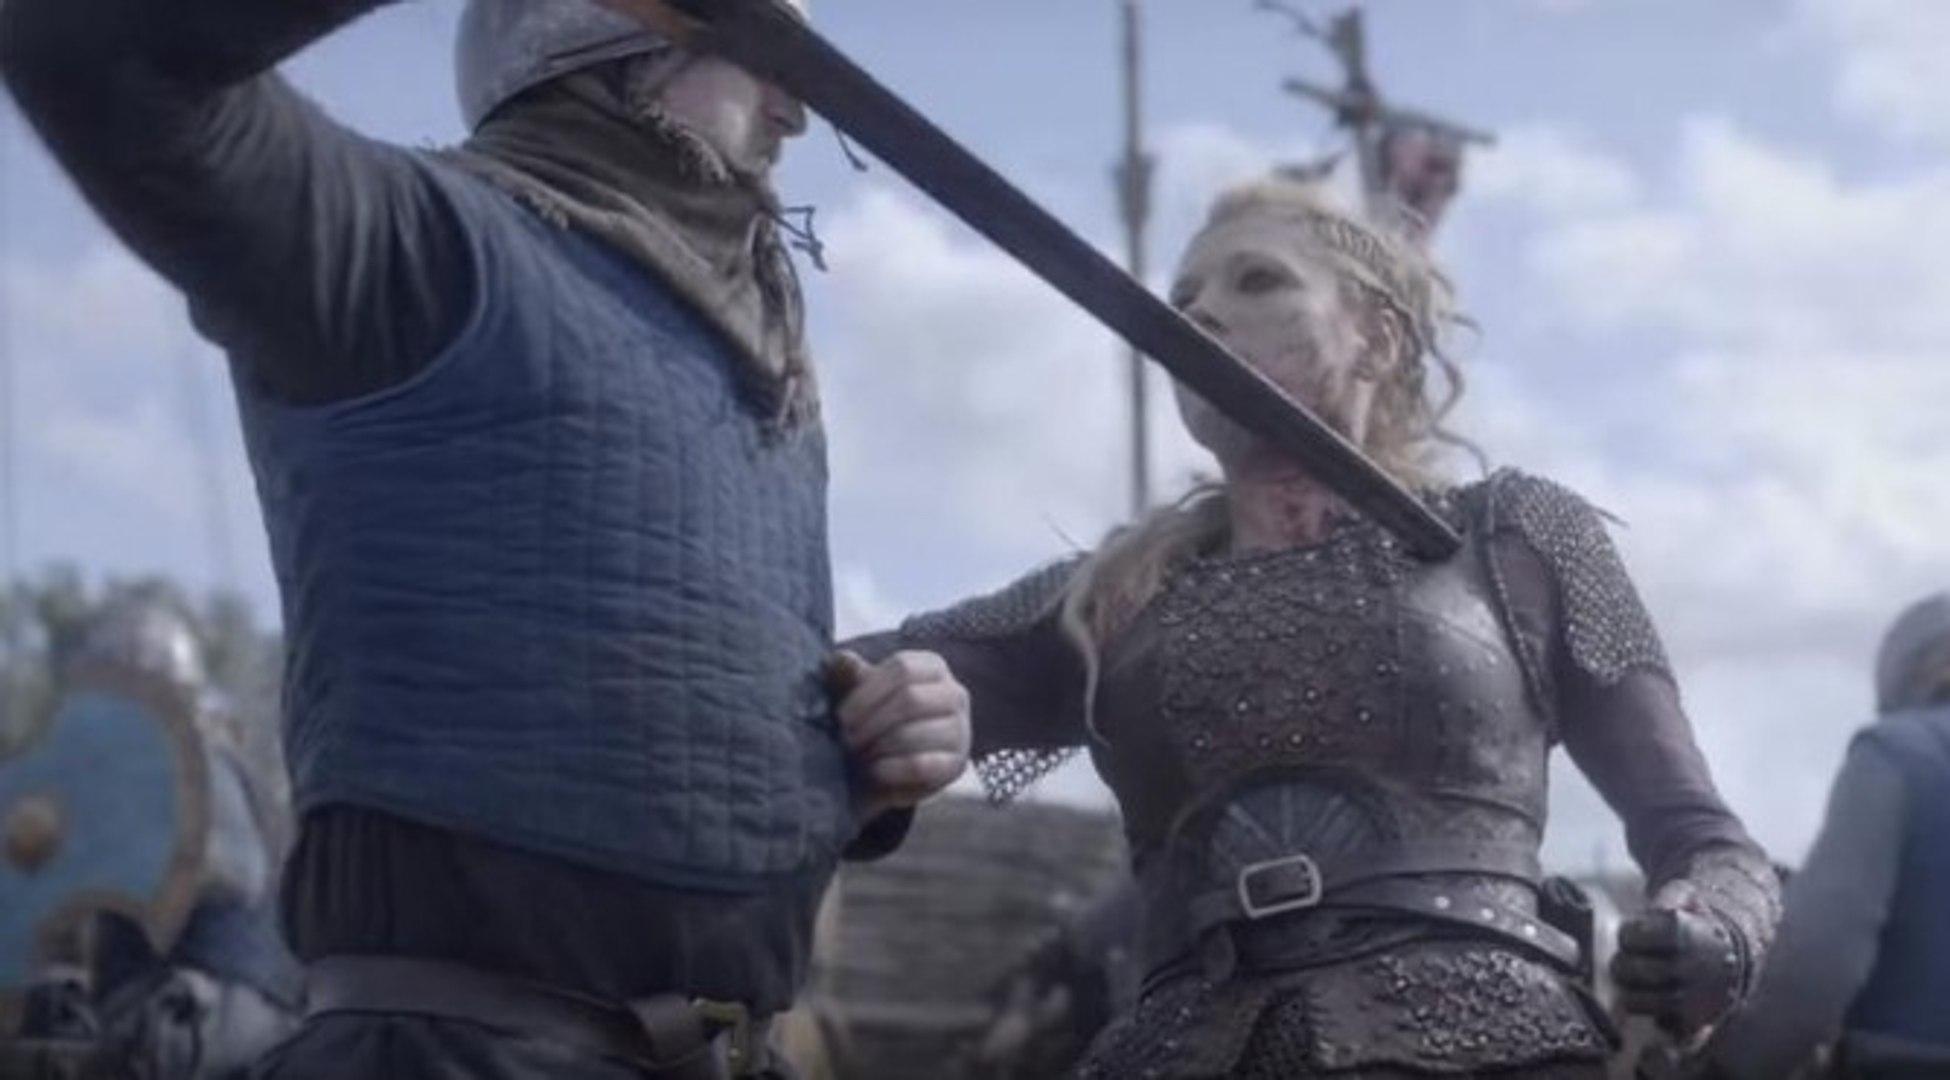 Official] Vikings Season 6 Episode 7 : English Subtitles